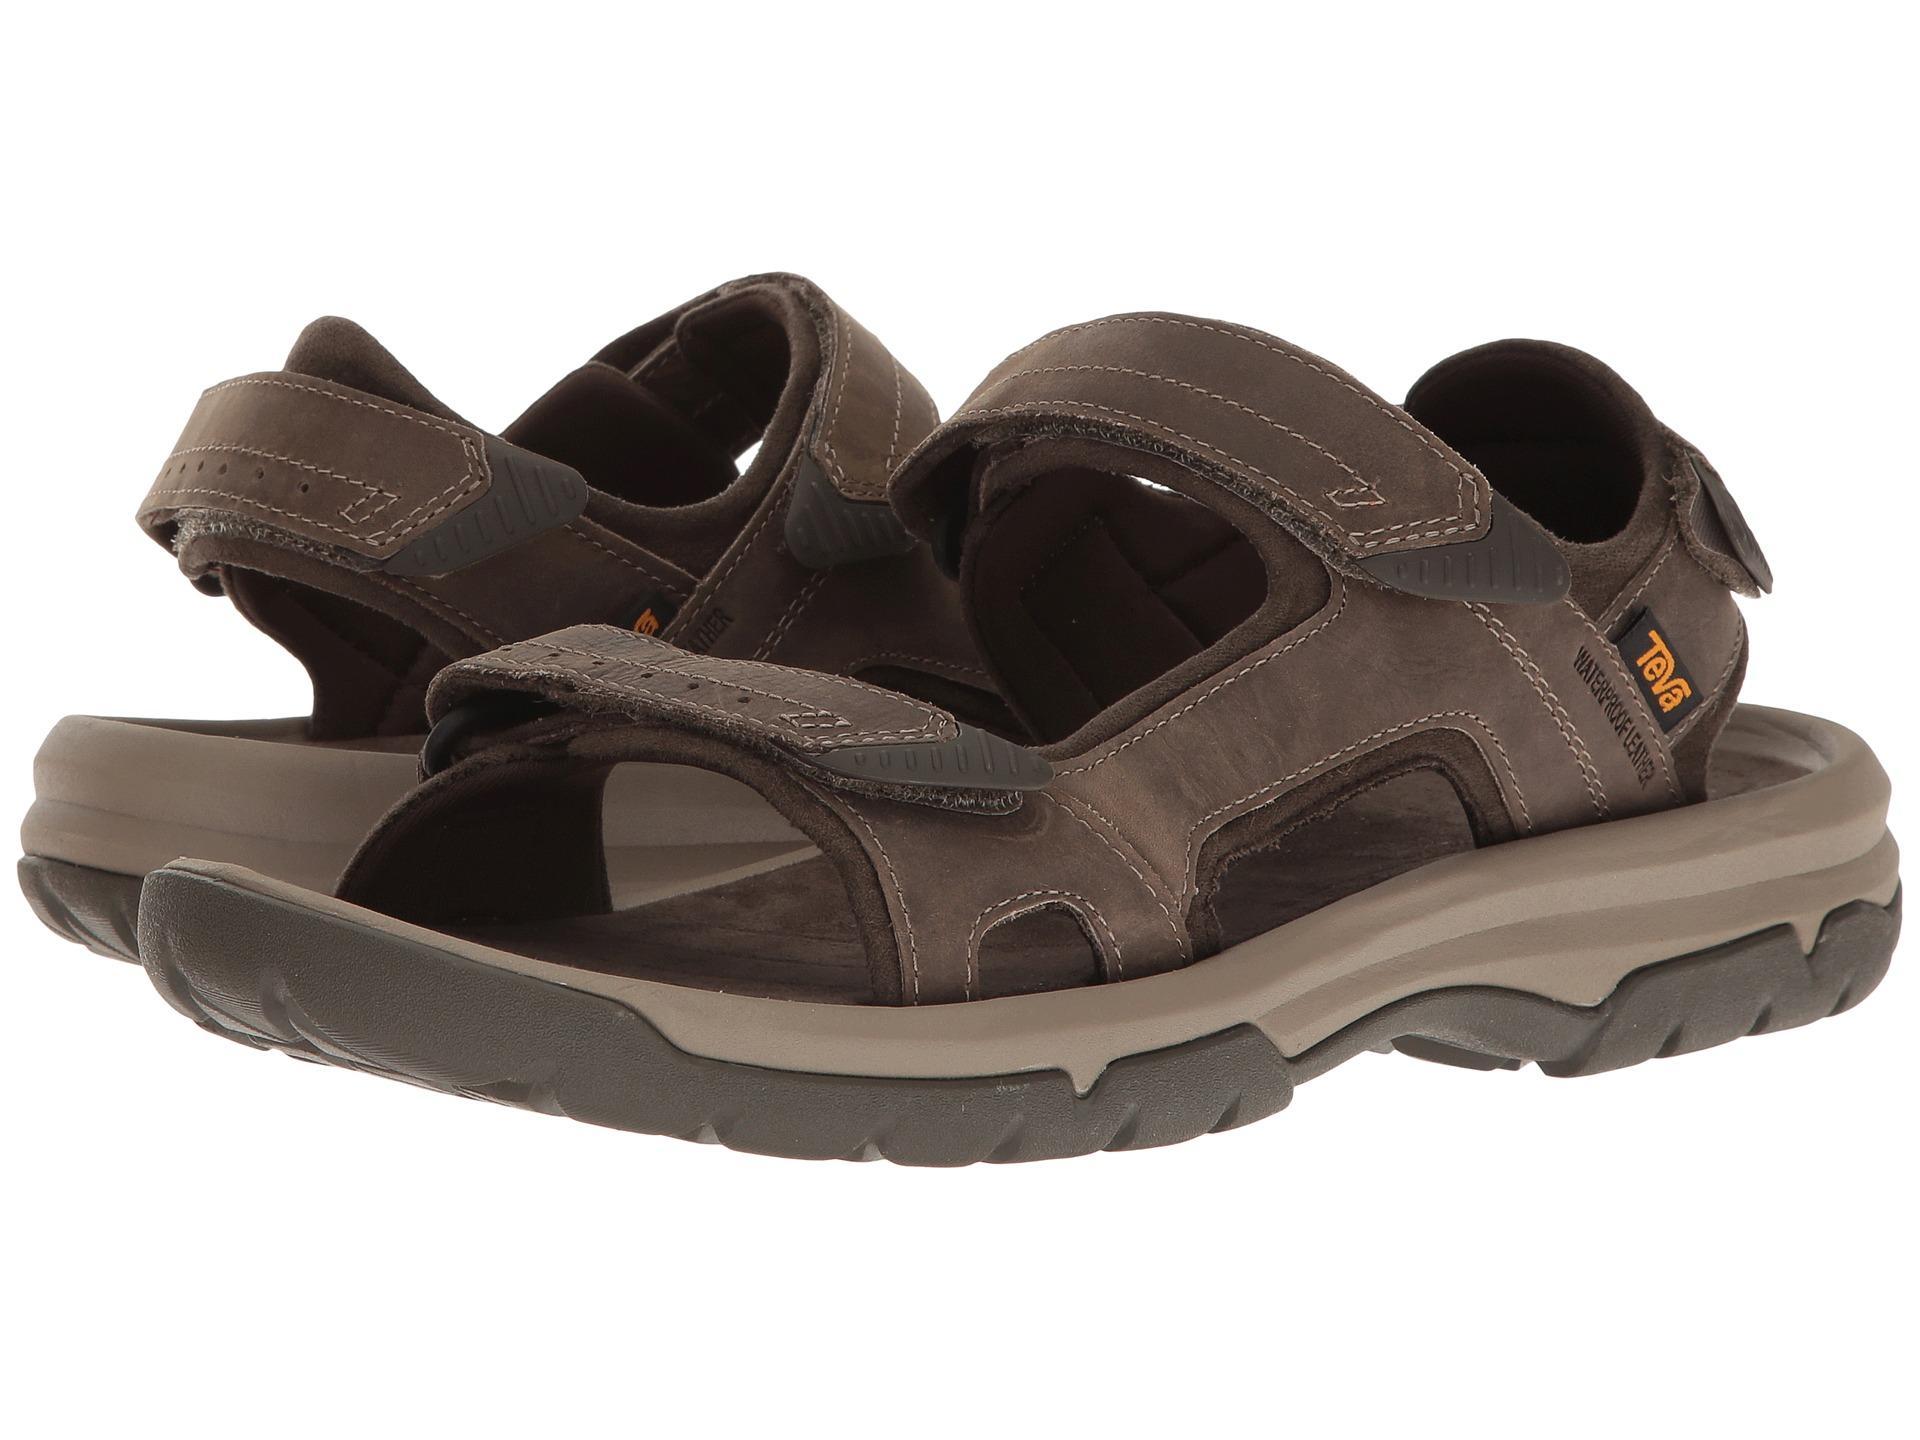 Teva Langdon Sandal In Brown For Men Lyst